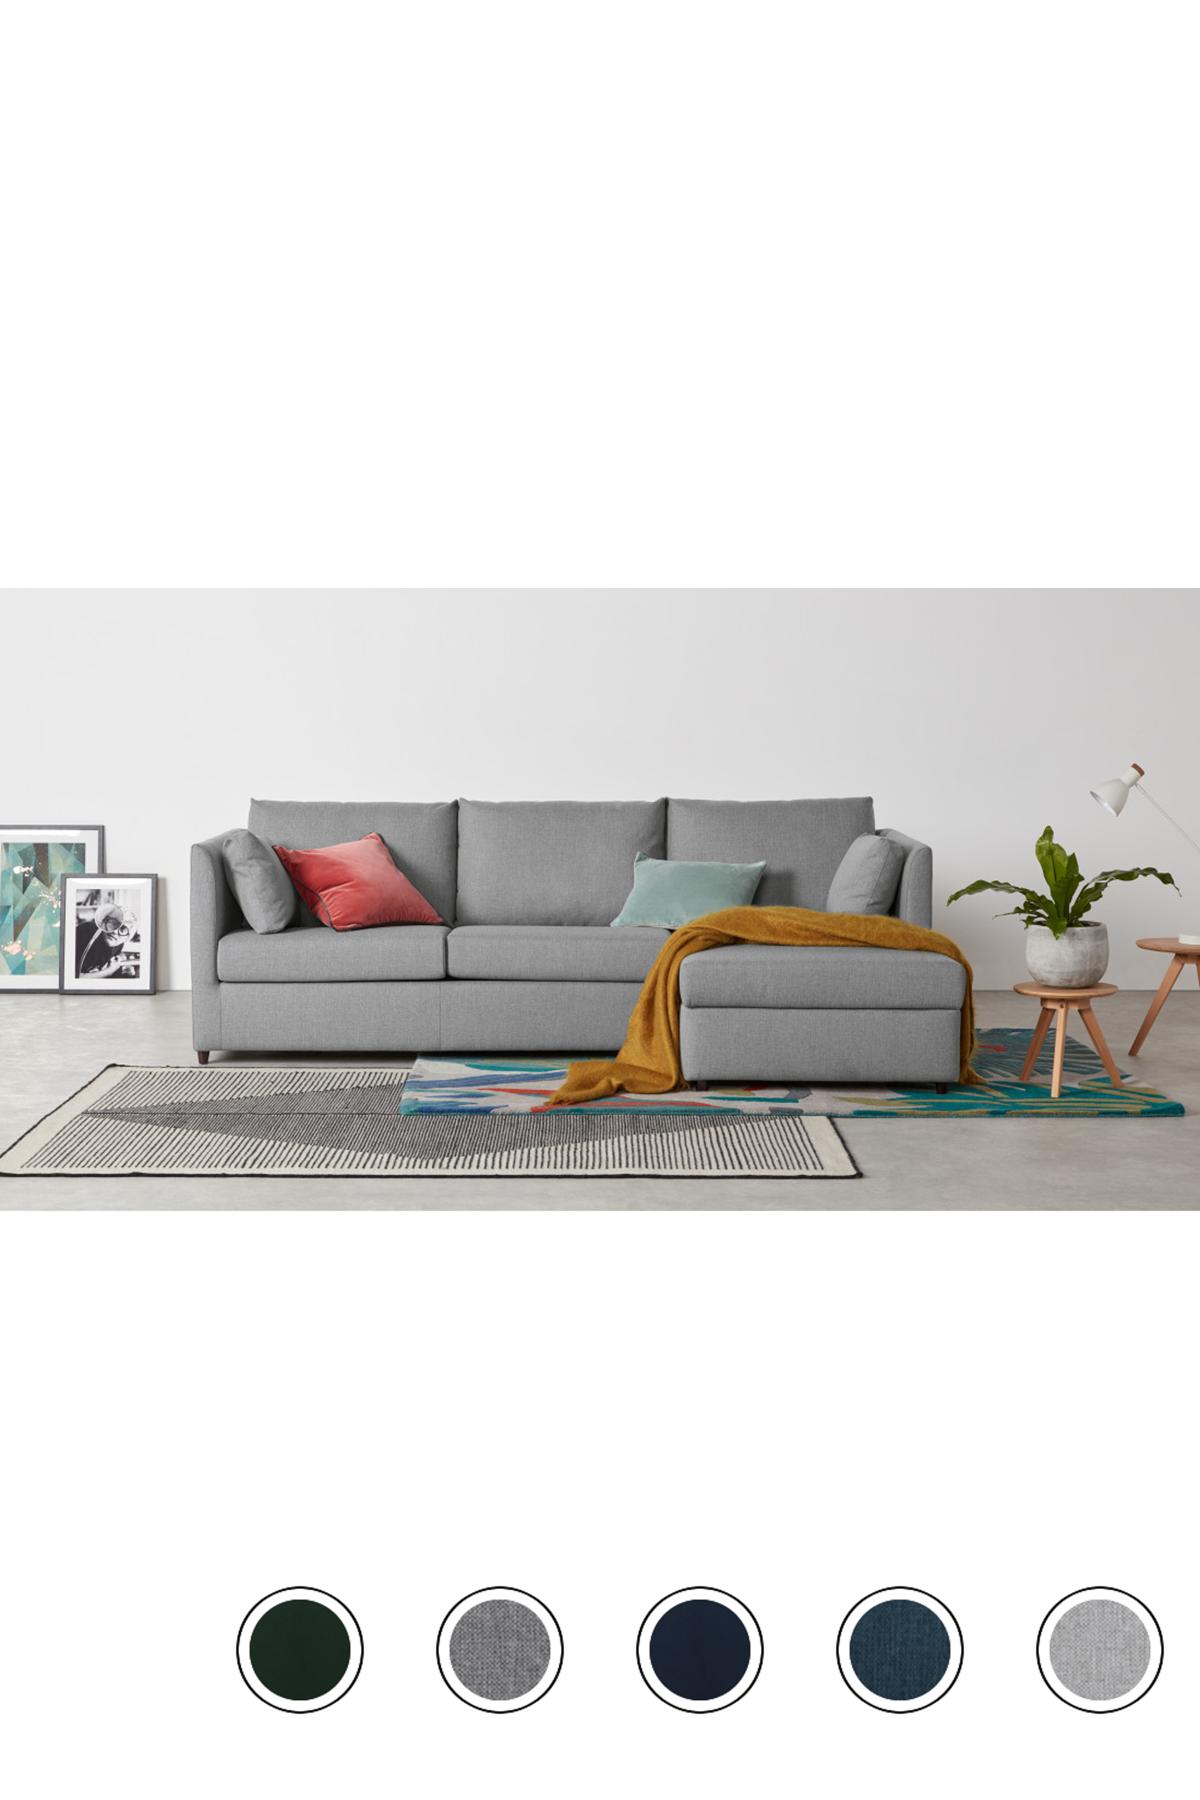 Milner Right Hand Facing Corner Storage Sofa Bed With Foam Mattress Granite Grey Grey Corner Sofa Bed Sofa Bed Living Room Sofa Bed Design